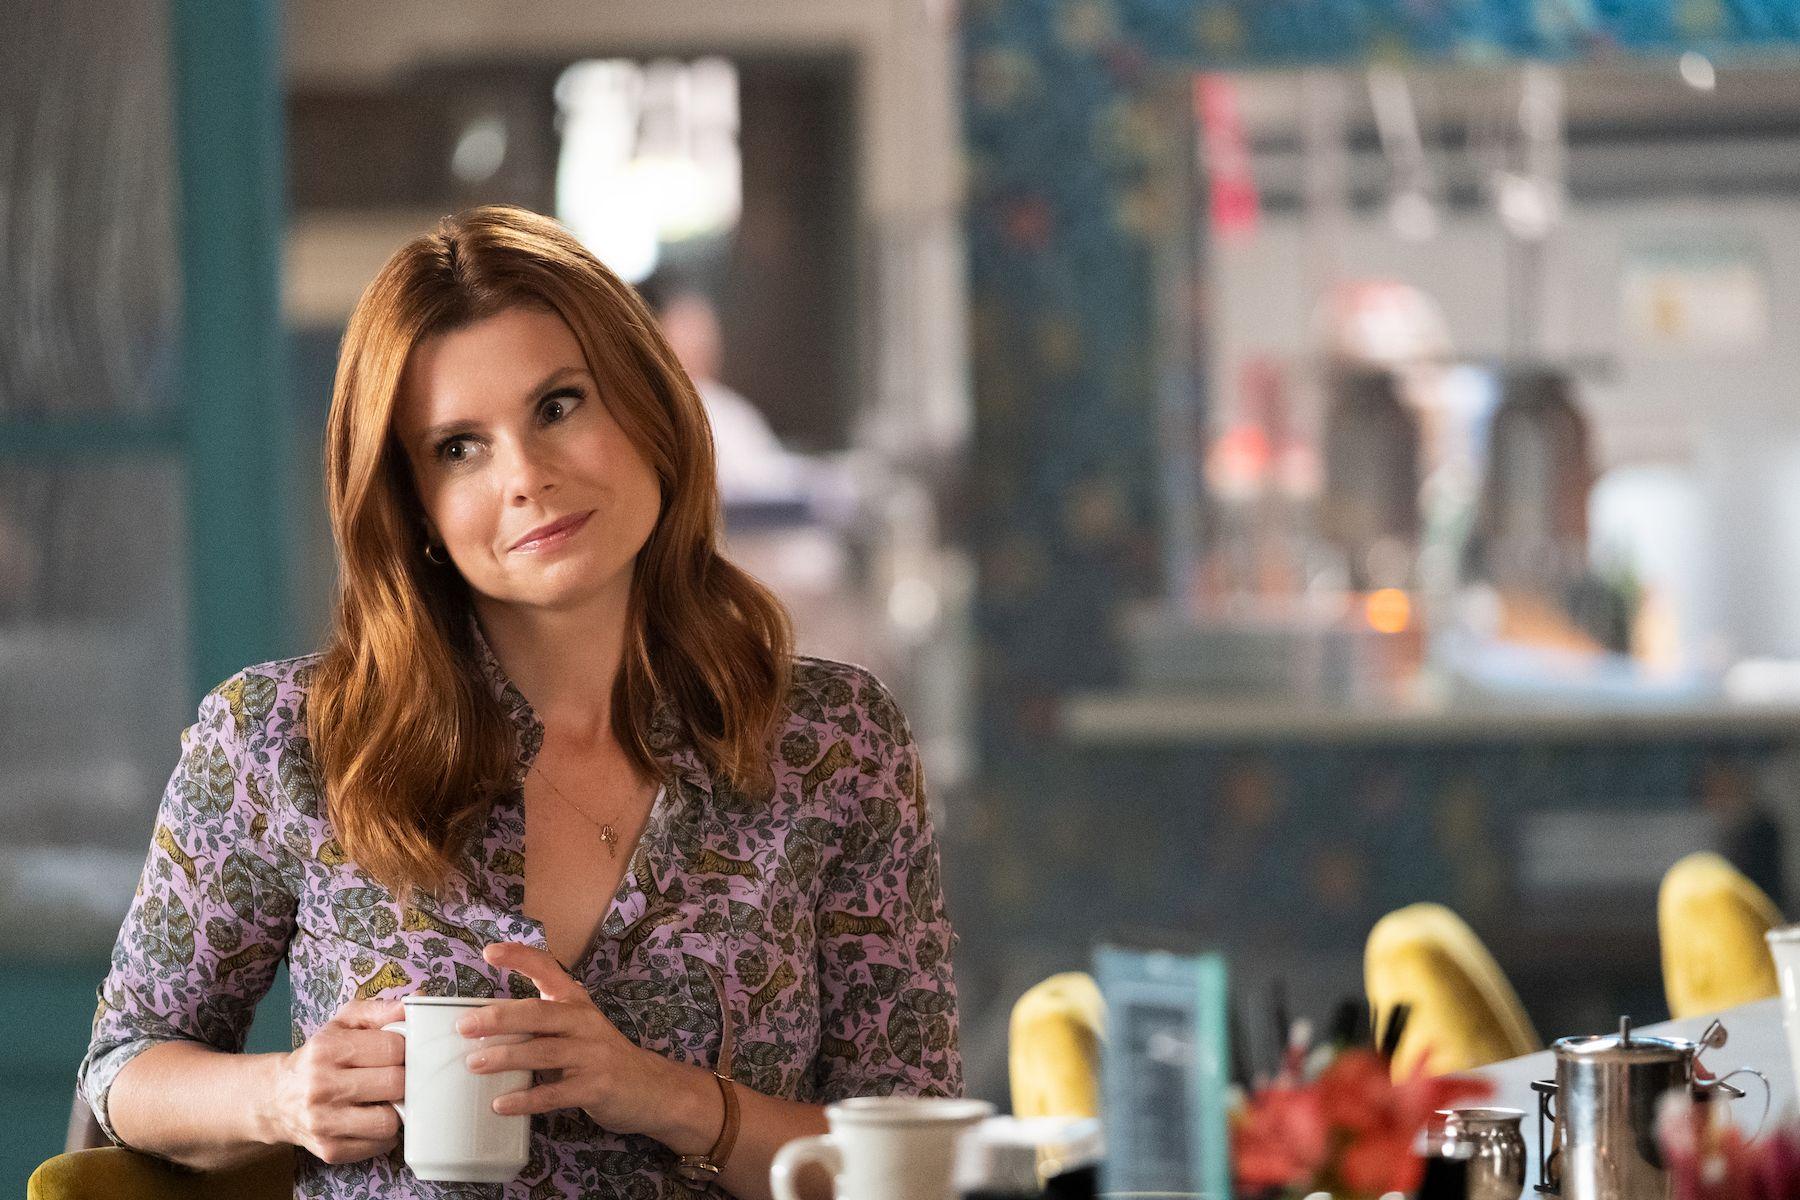 JoAnna Garcia Swisher Says Sweet Magnolias Season 2 Needs To Push ...